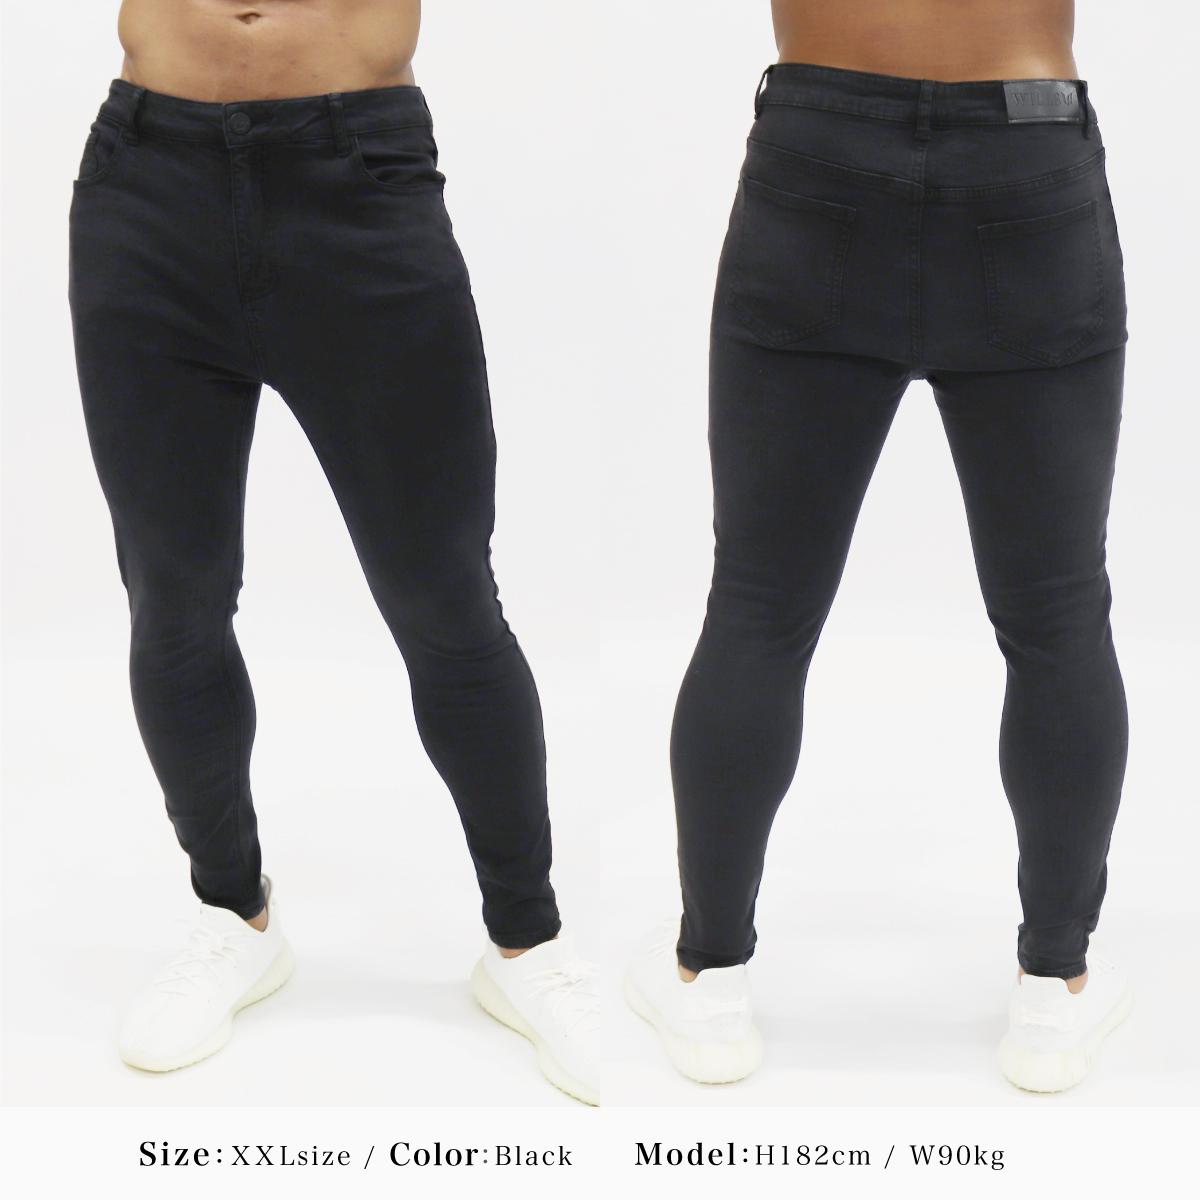 SUPER STRETCH SKINNY JEANS - BLACK